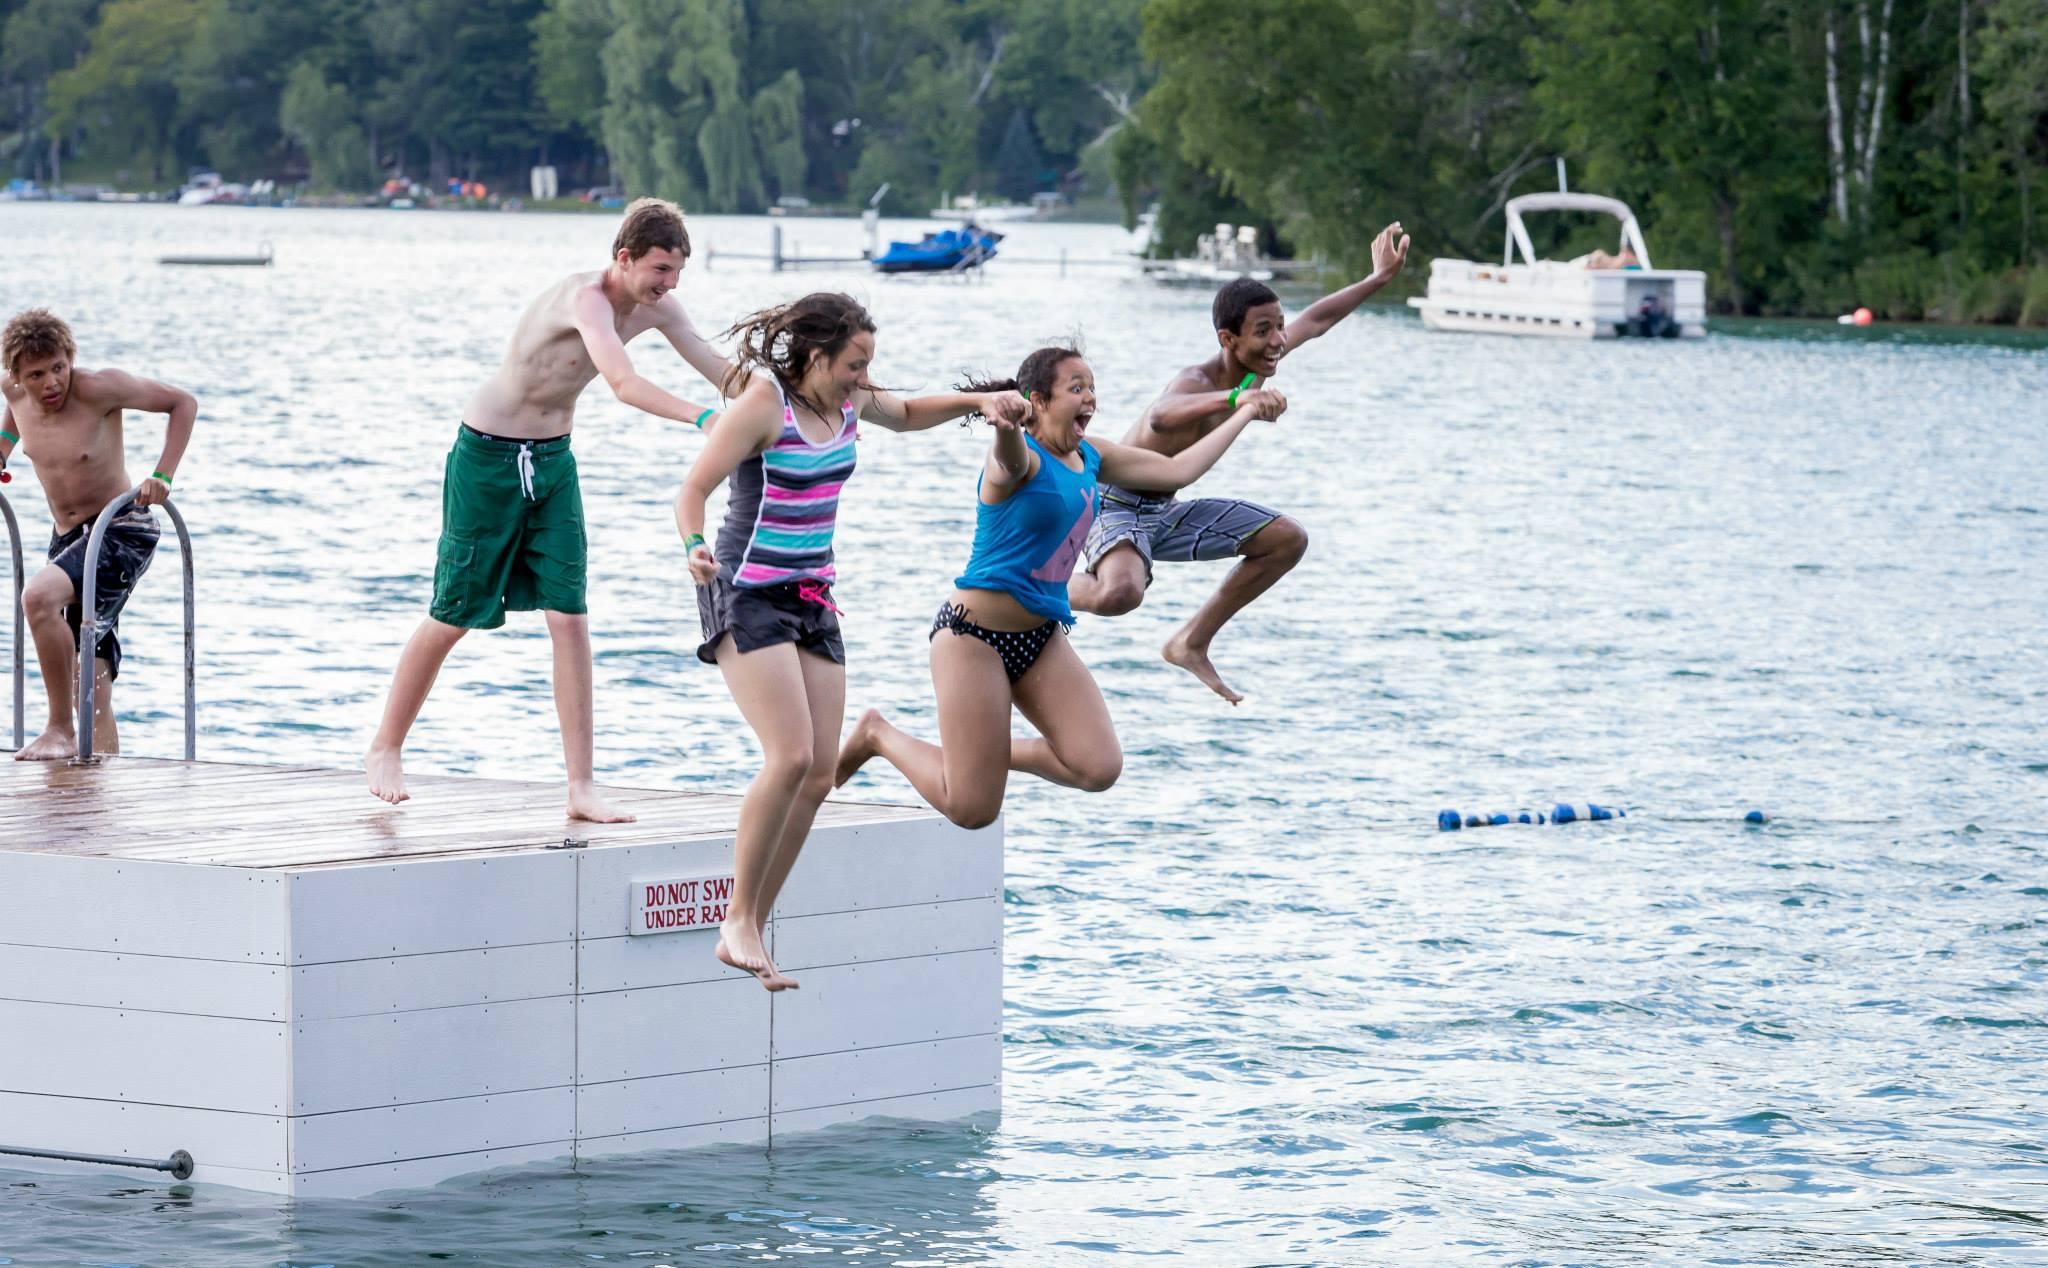 1a raft